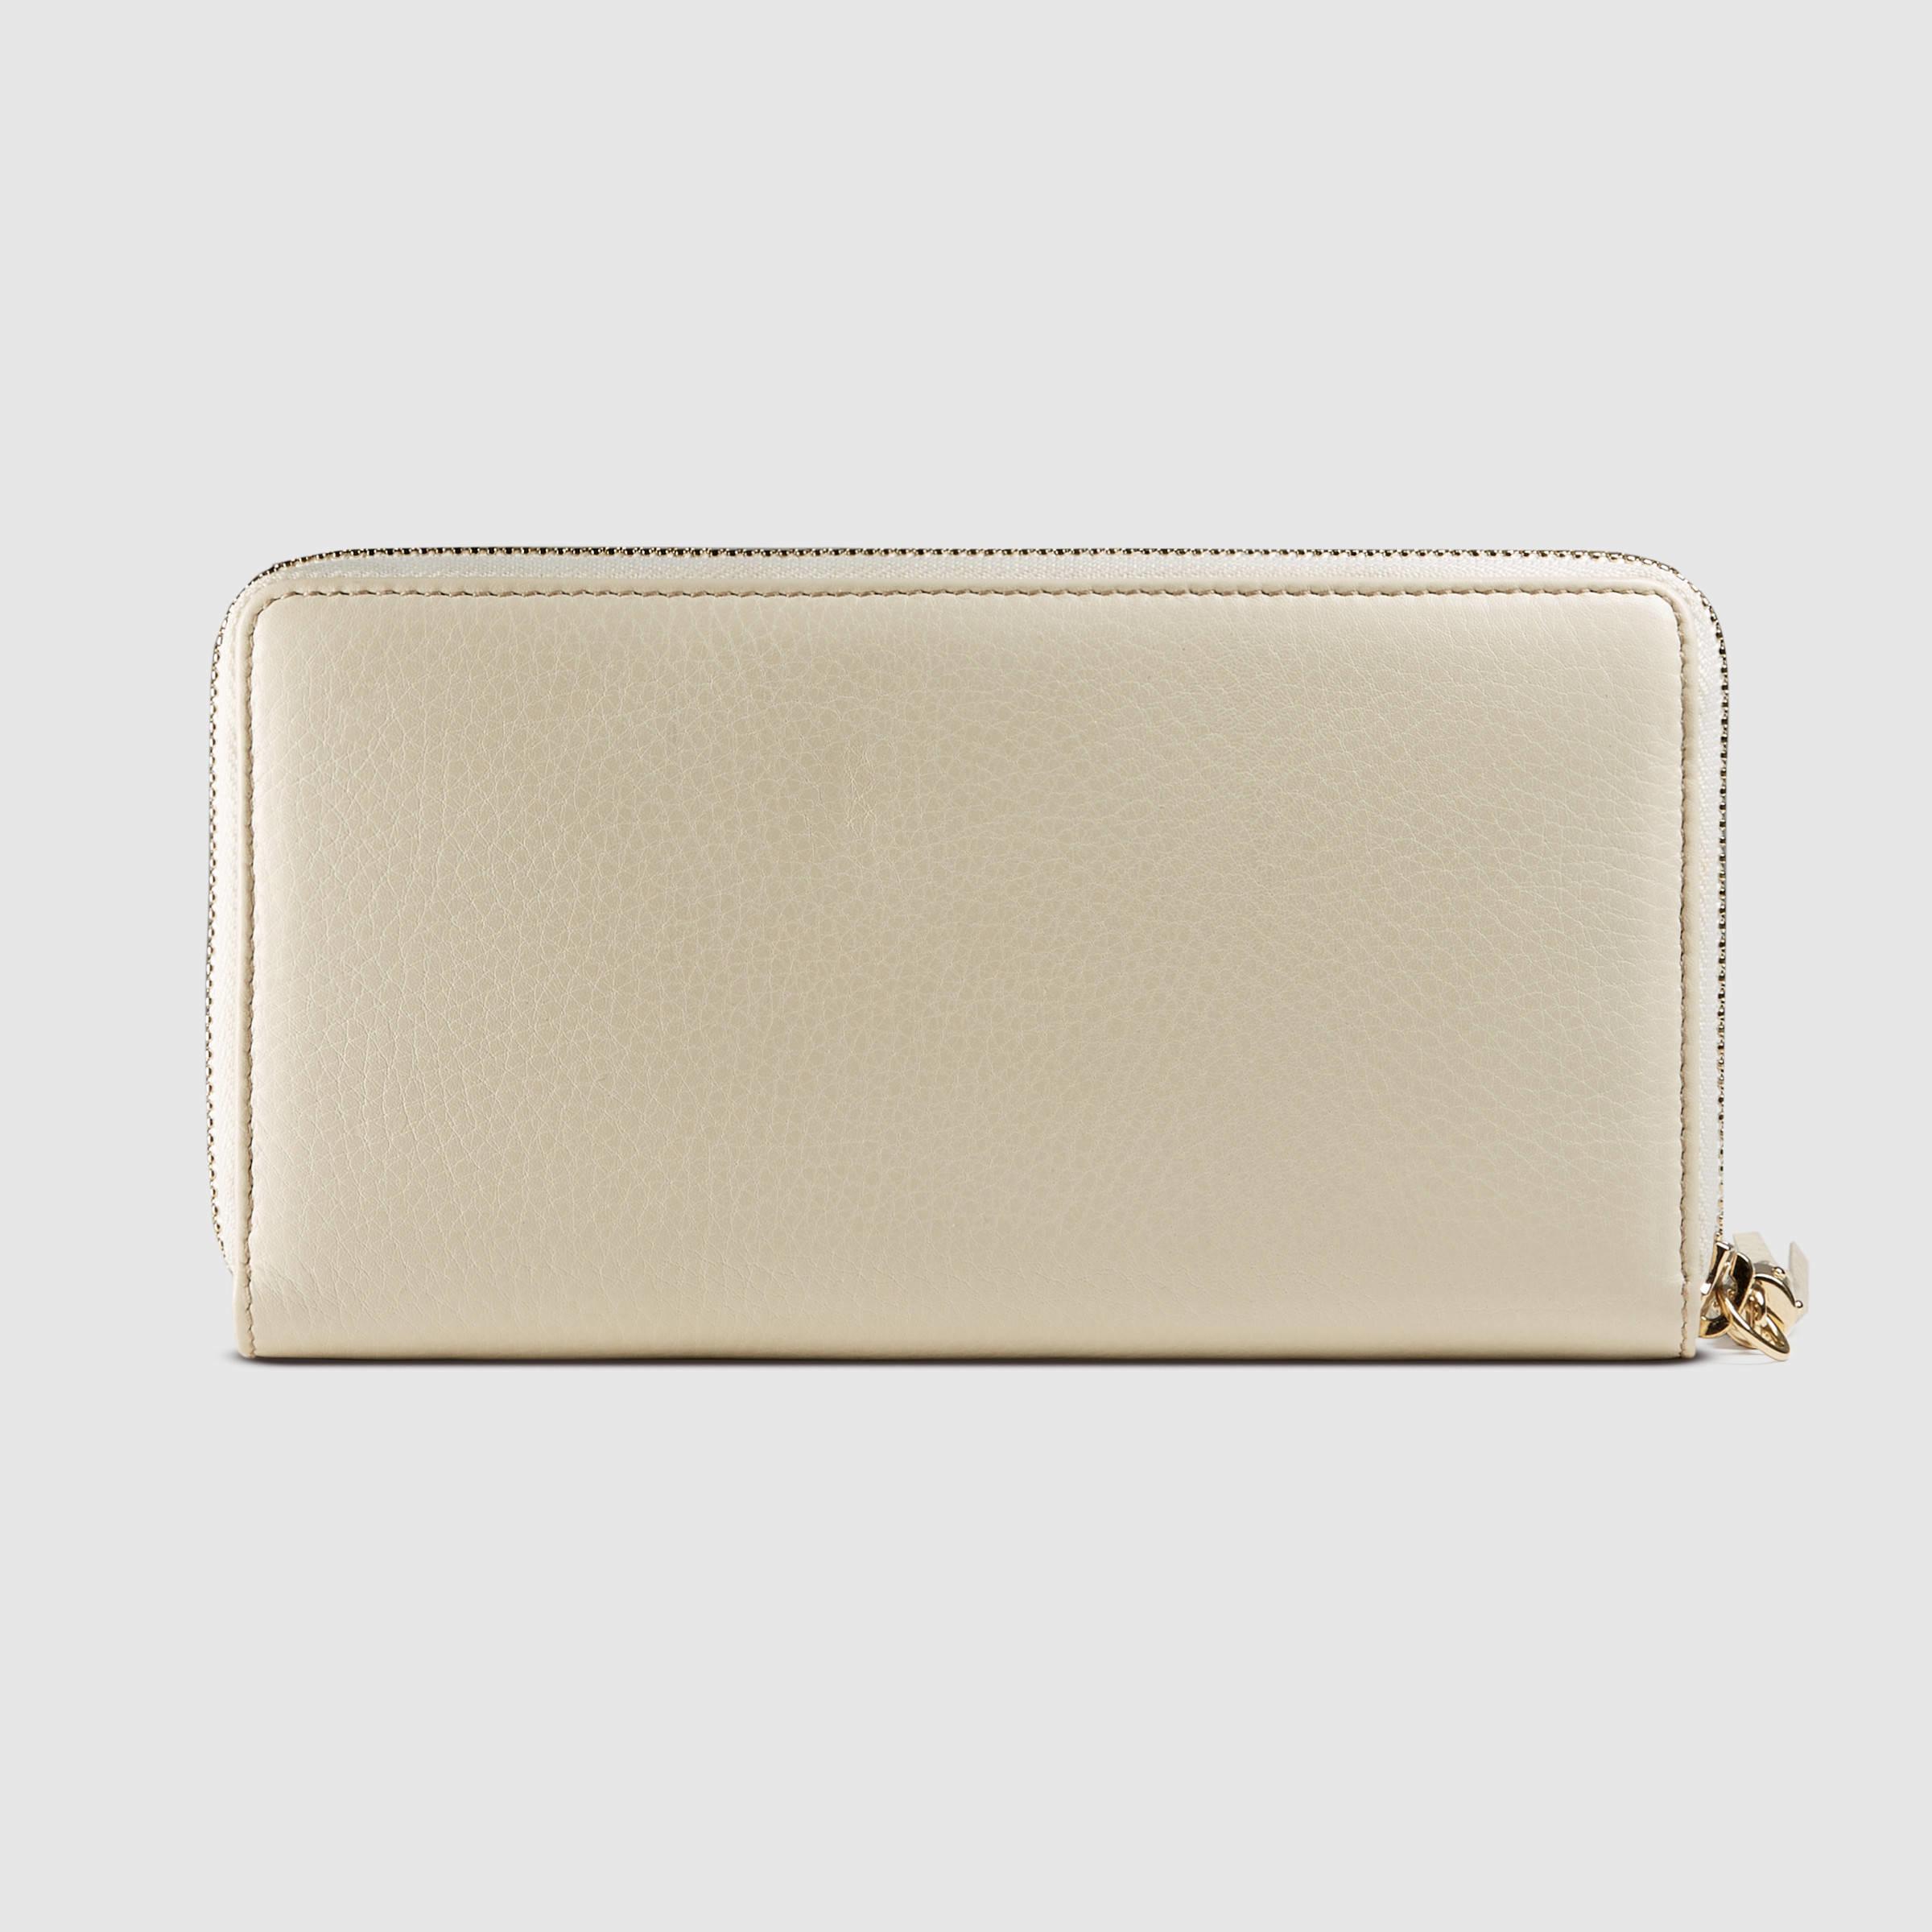 26cb6c881c7 Lyst - Gucci Soho Leather Zip Around Wallet in White